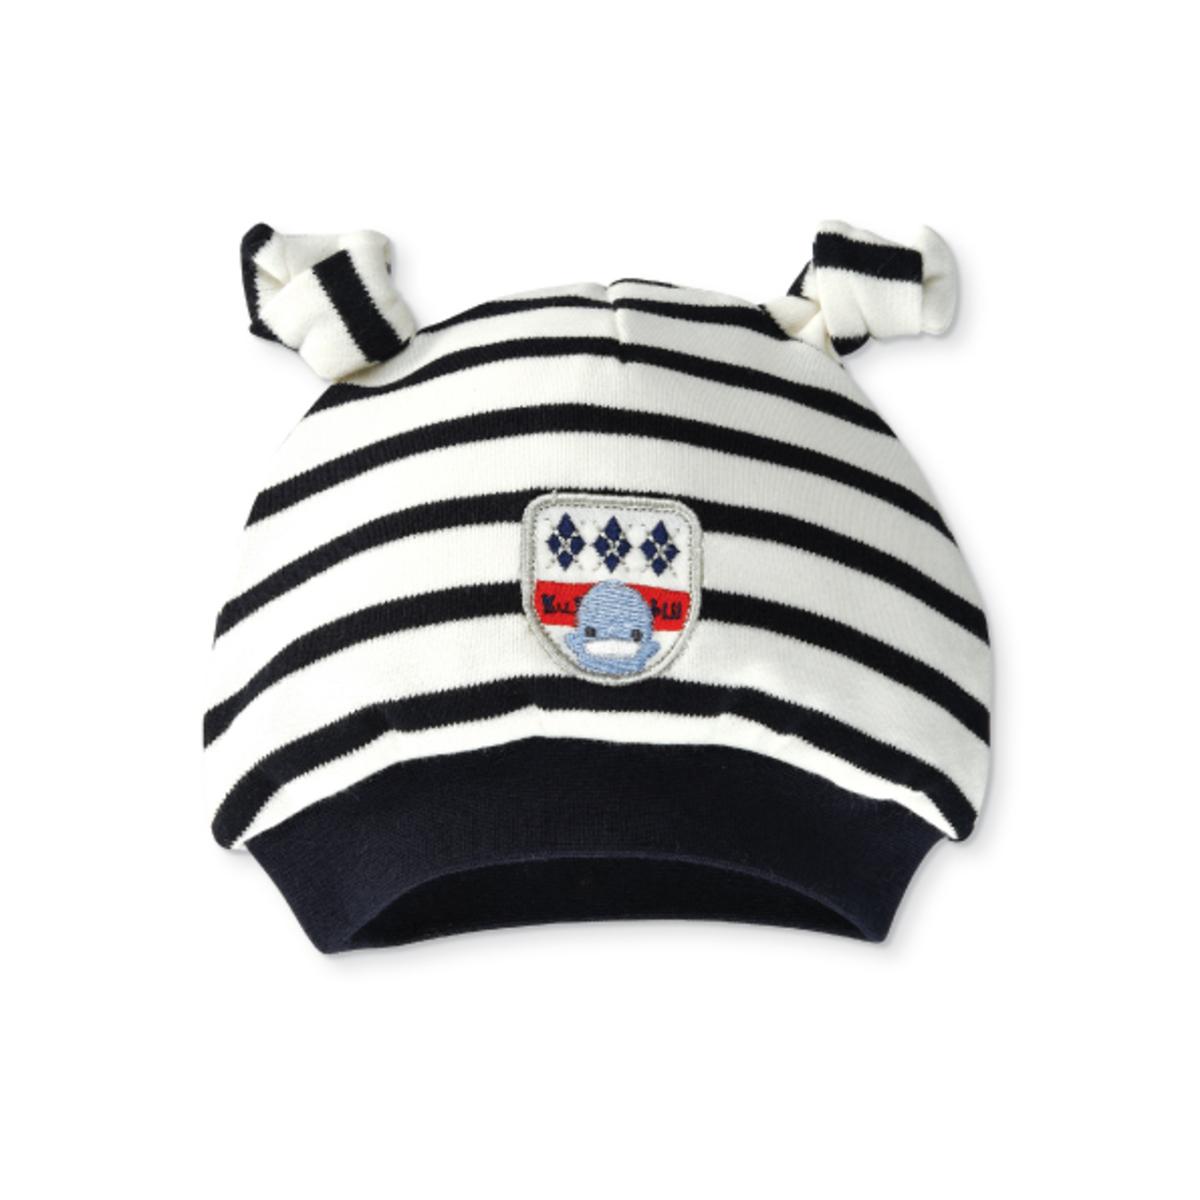 KUKU Baby Hat - Blue